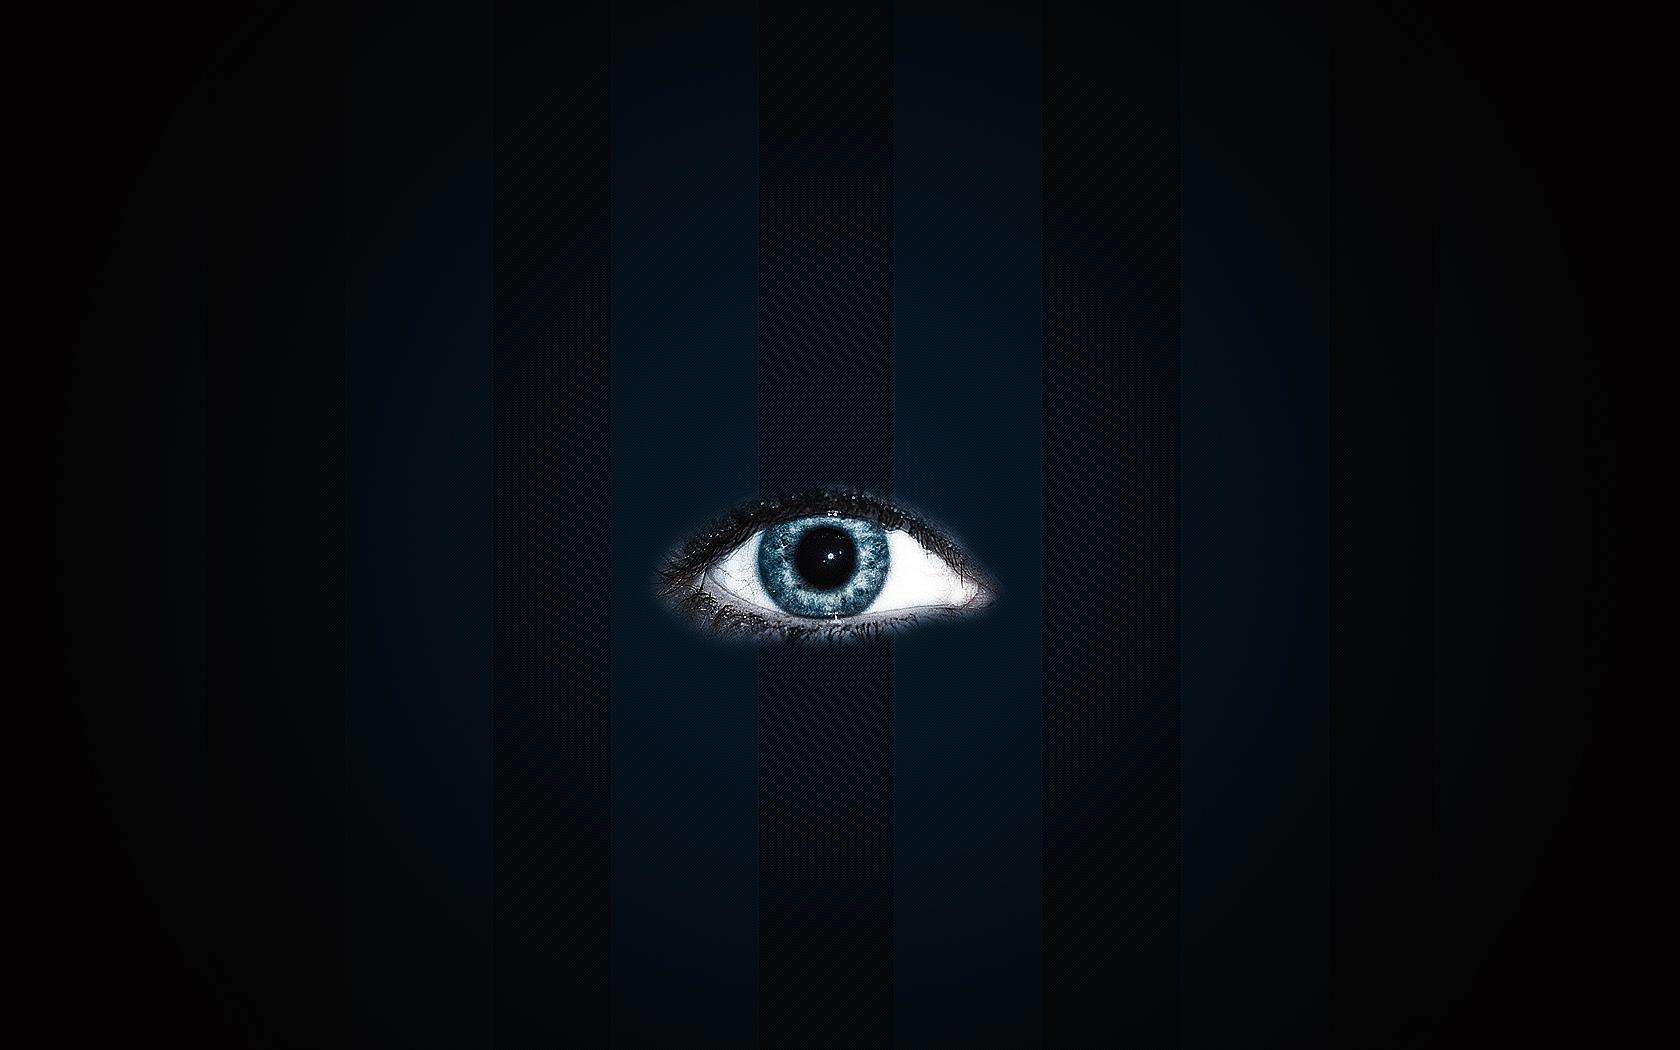 Eye Wallpaper Pack by jimmytm on DeviantArt